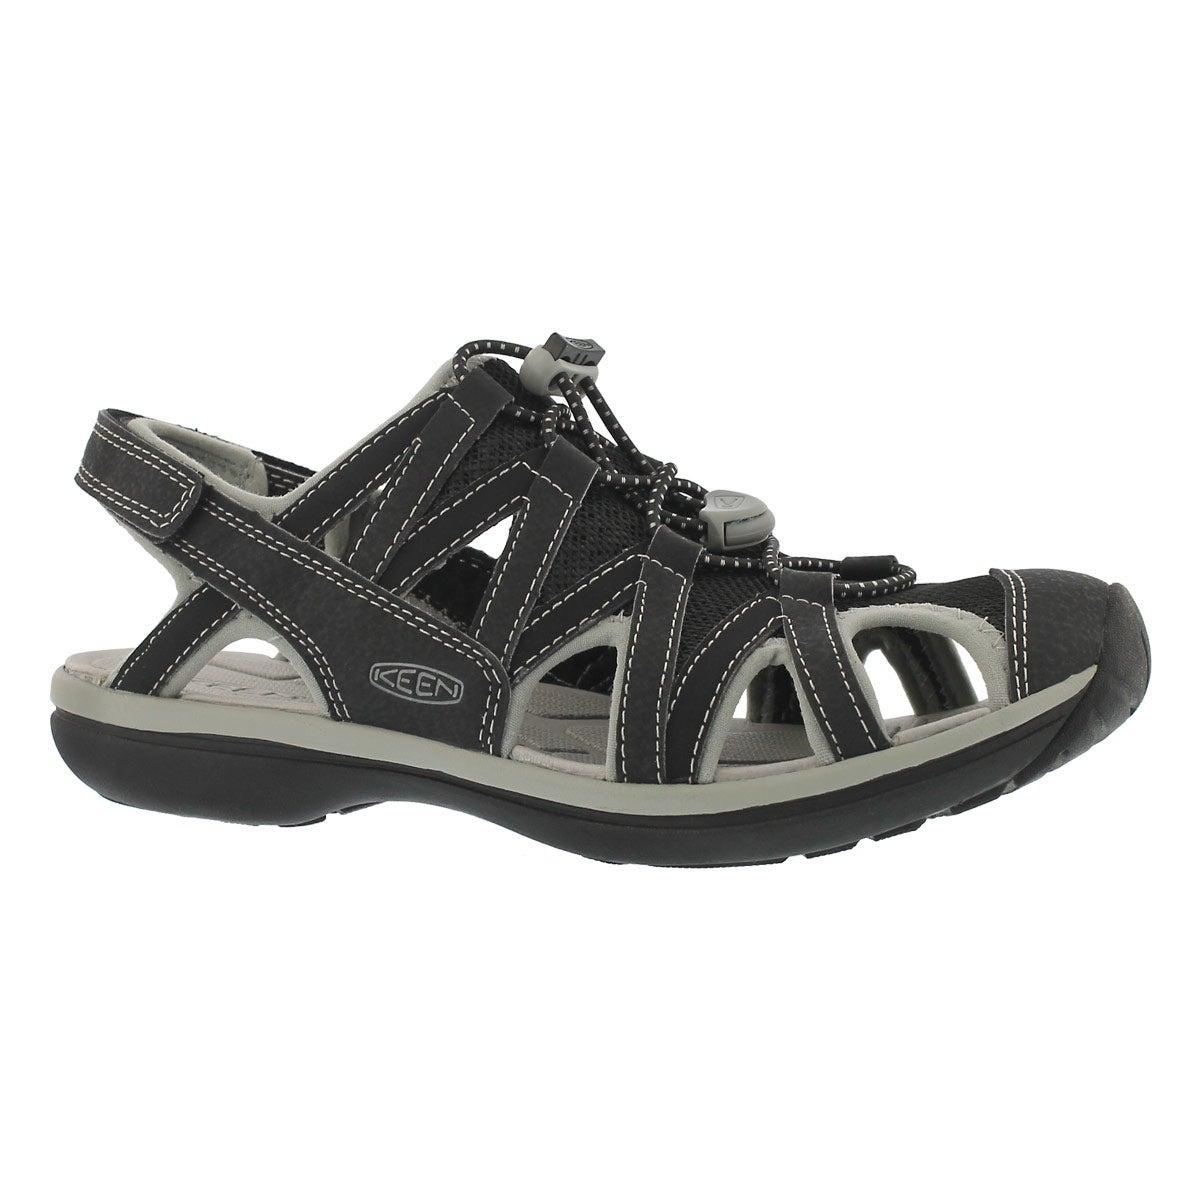 Mens Footwear - Mens Sport Sandals Manufacturer from Agra